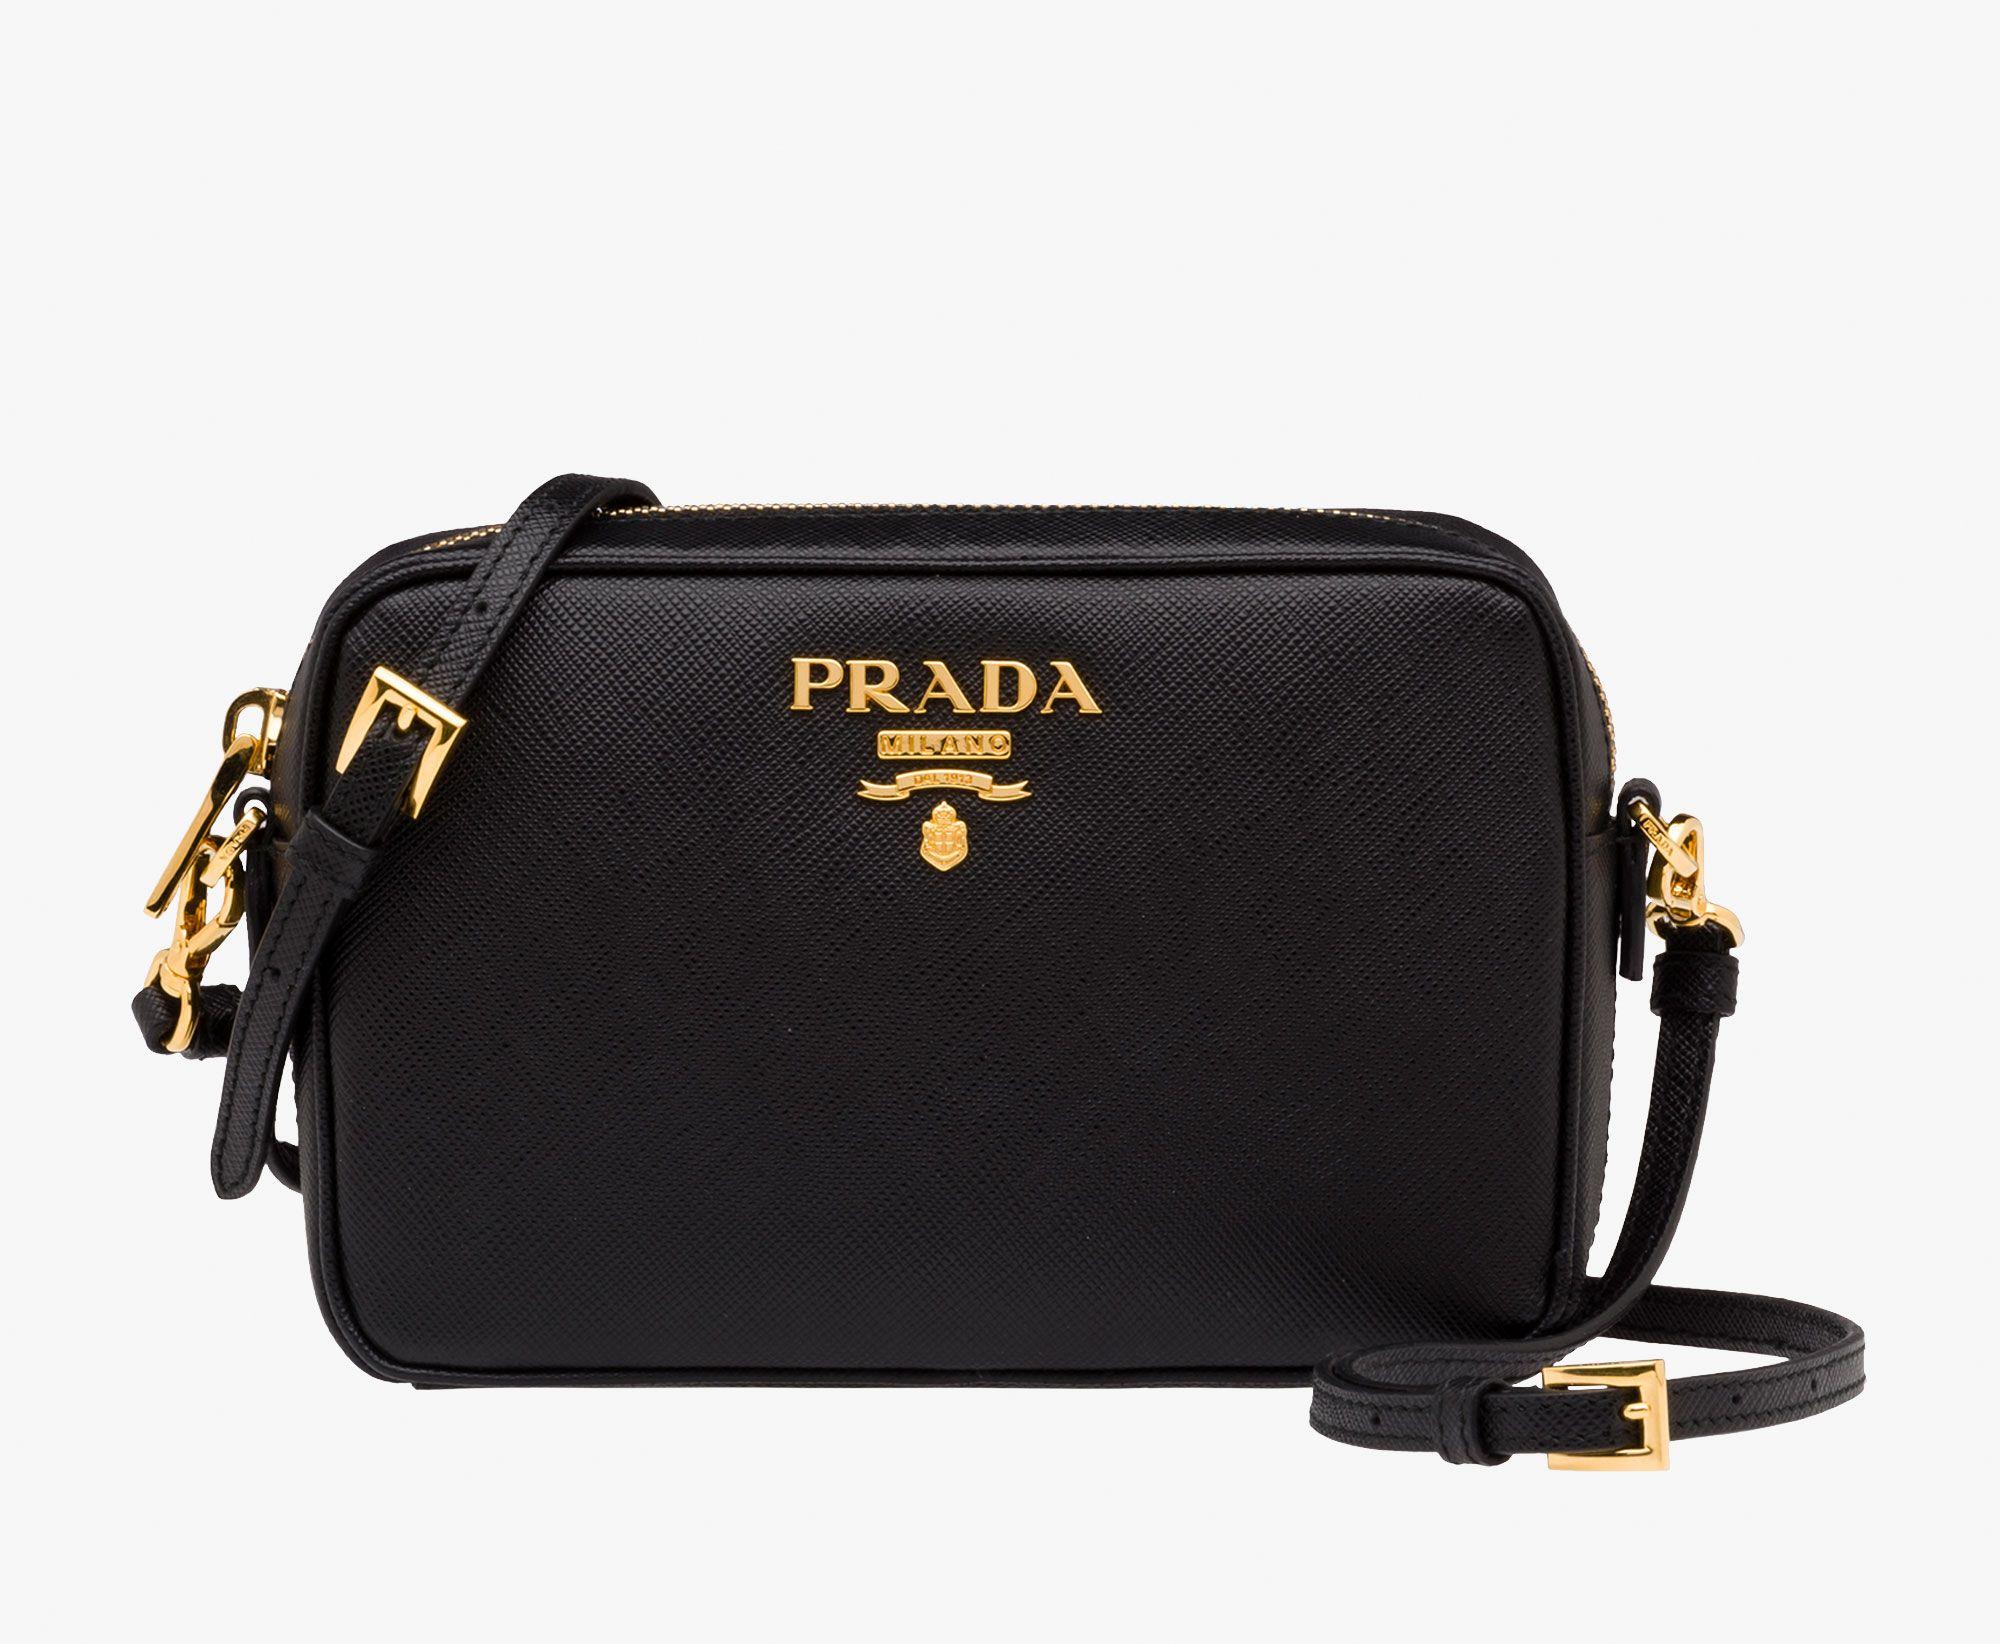 01ae2451a Prada Woman - Bandolera de cuero - Negro - 1BH036_NZV_F0002_V_OOO ...